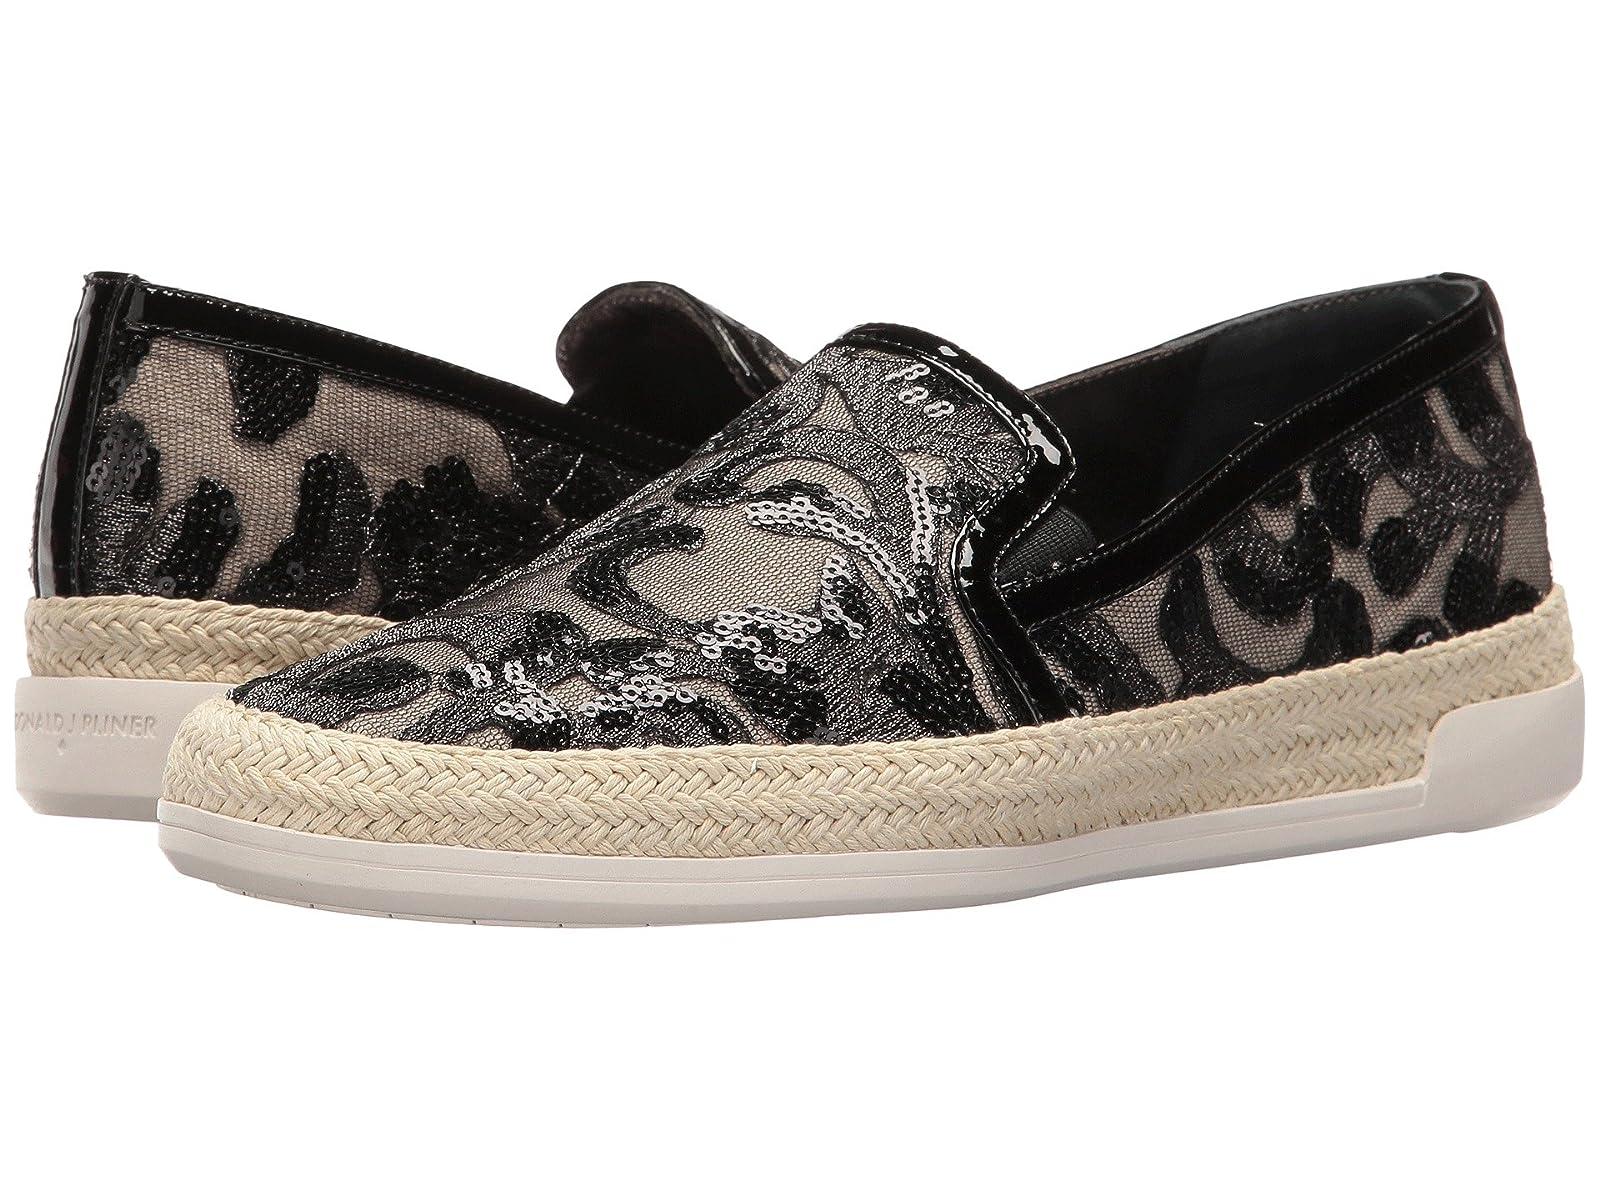 Donald J Pliner PamelaCheap and distinctive eye-catching shoes